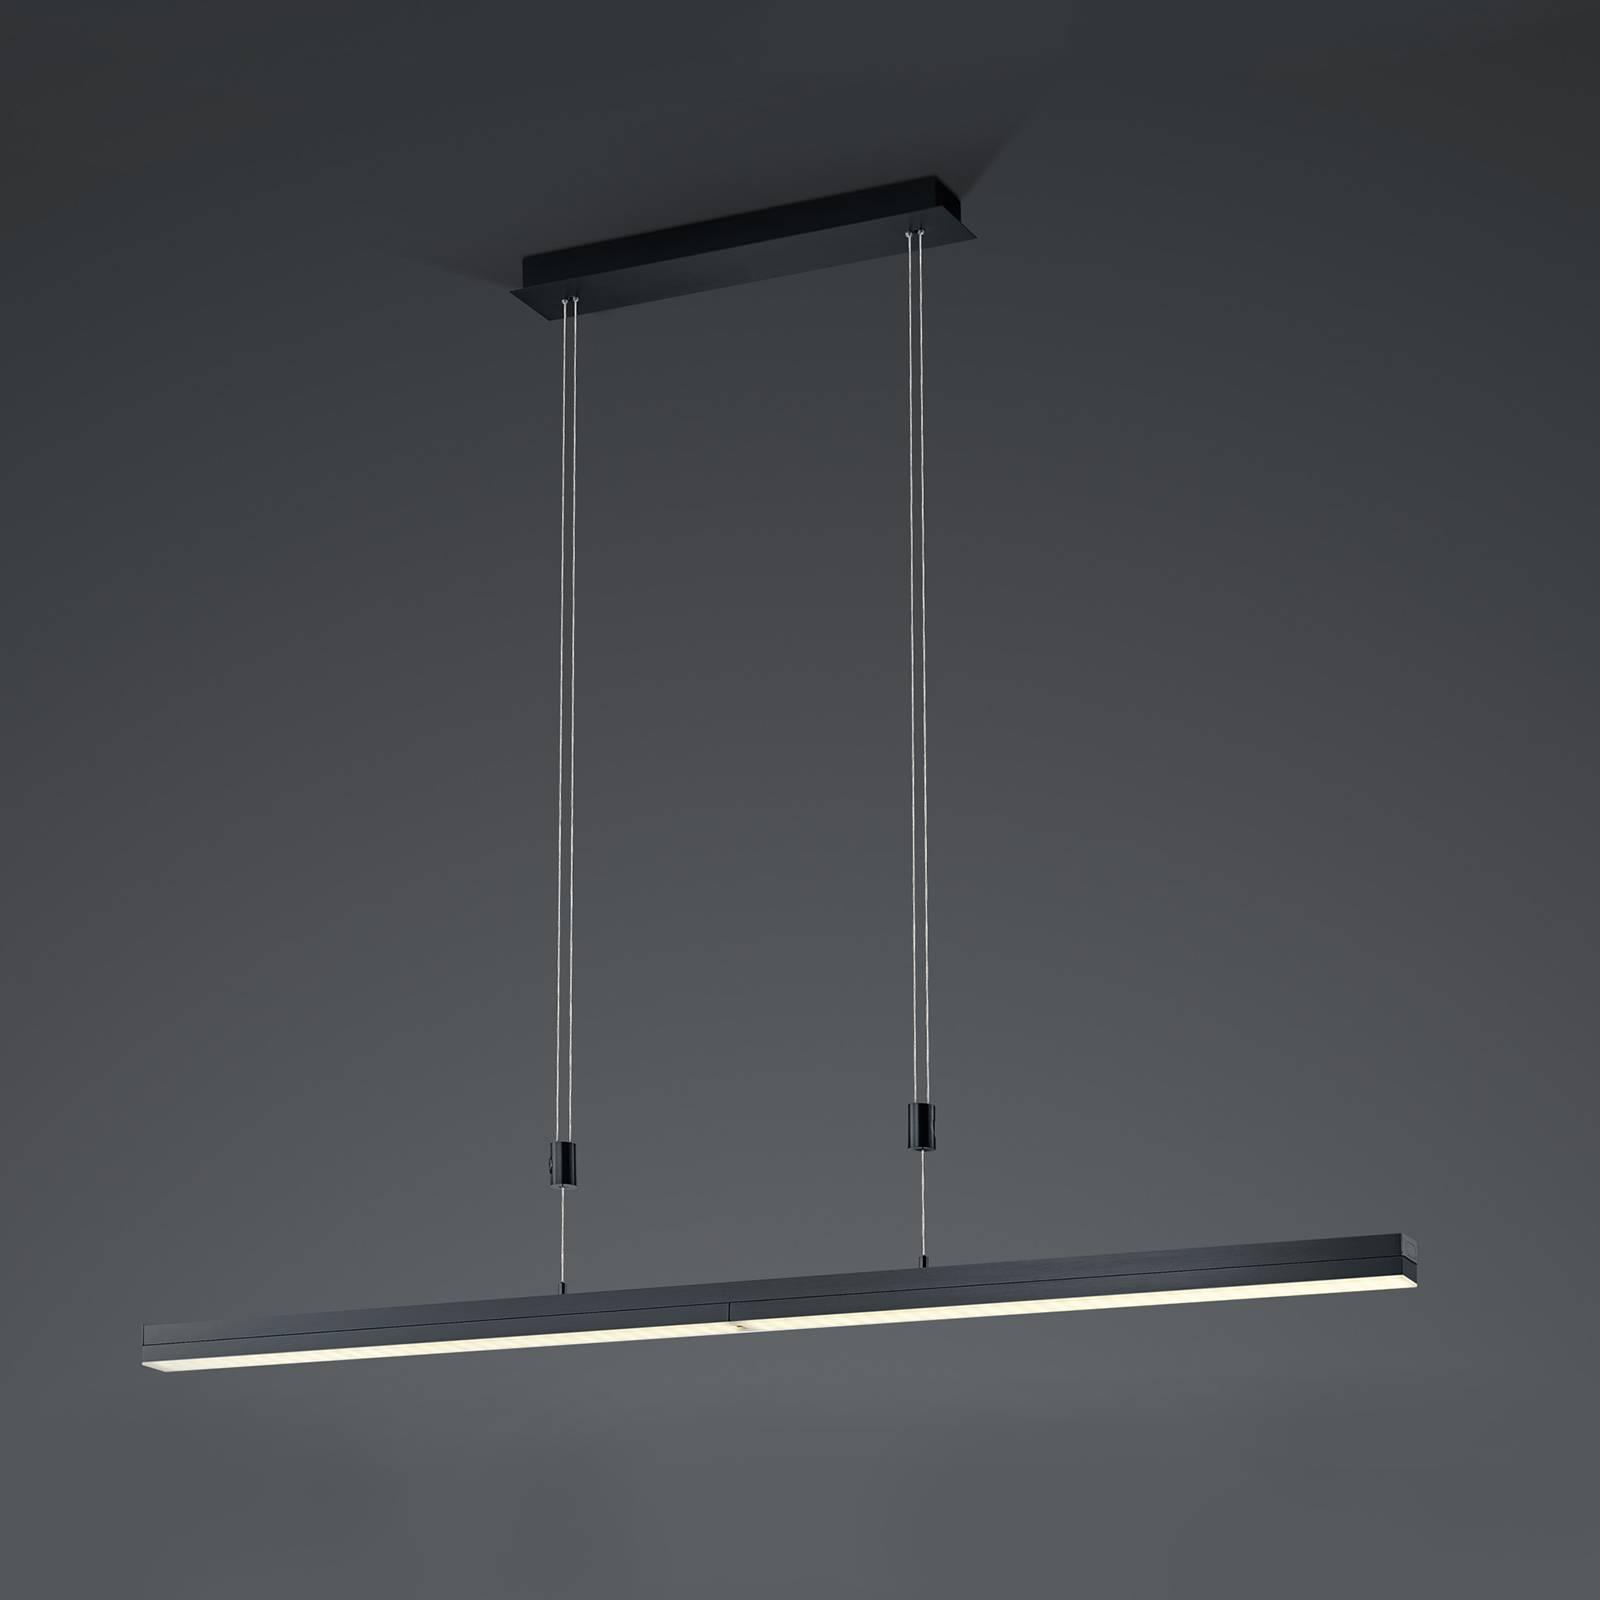 B-Leuchten Expanda-X LED-Pendelleuchte, anthrazit